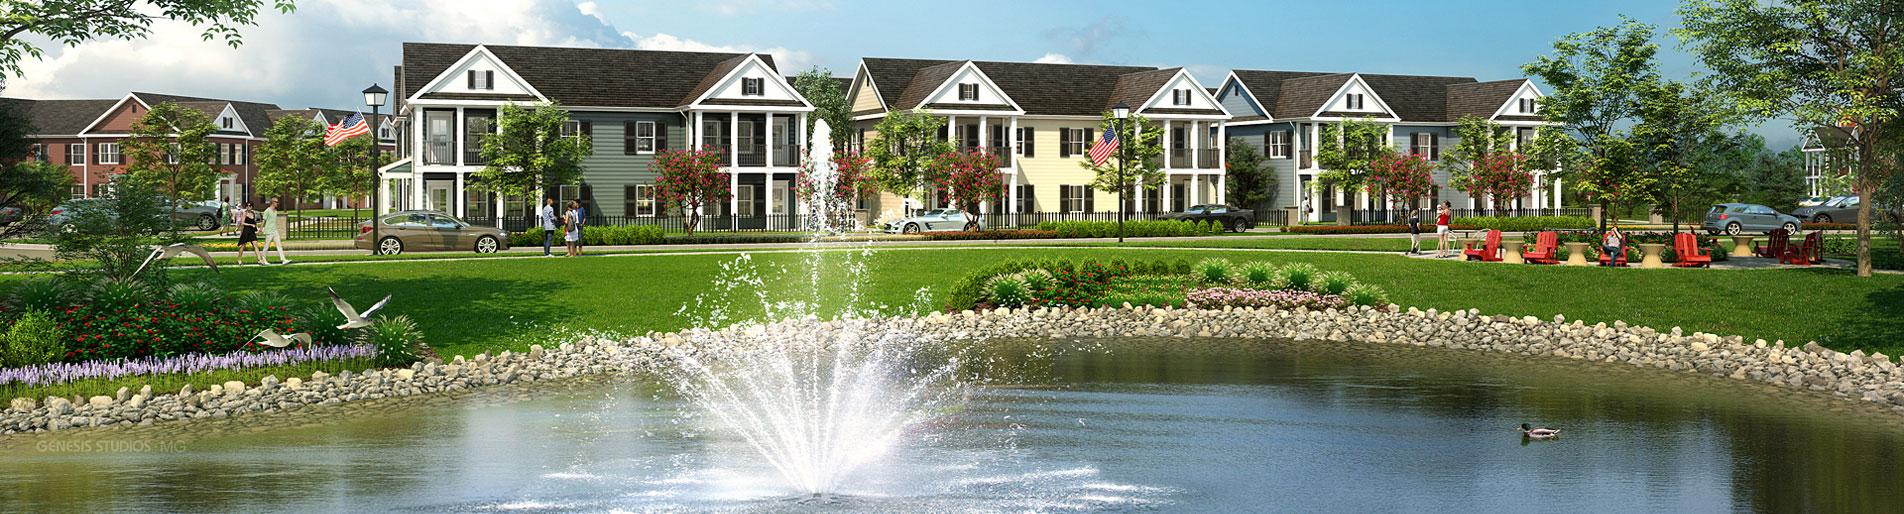 717076 Digital Photorealistic Architectural Renderings of Westbrook Exterior for Greenview Properties